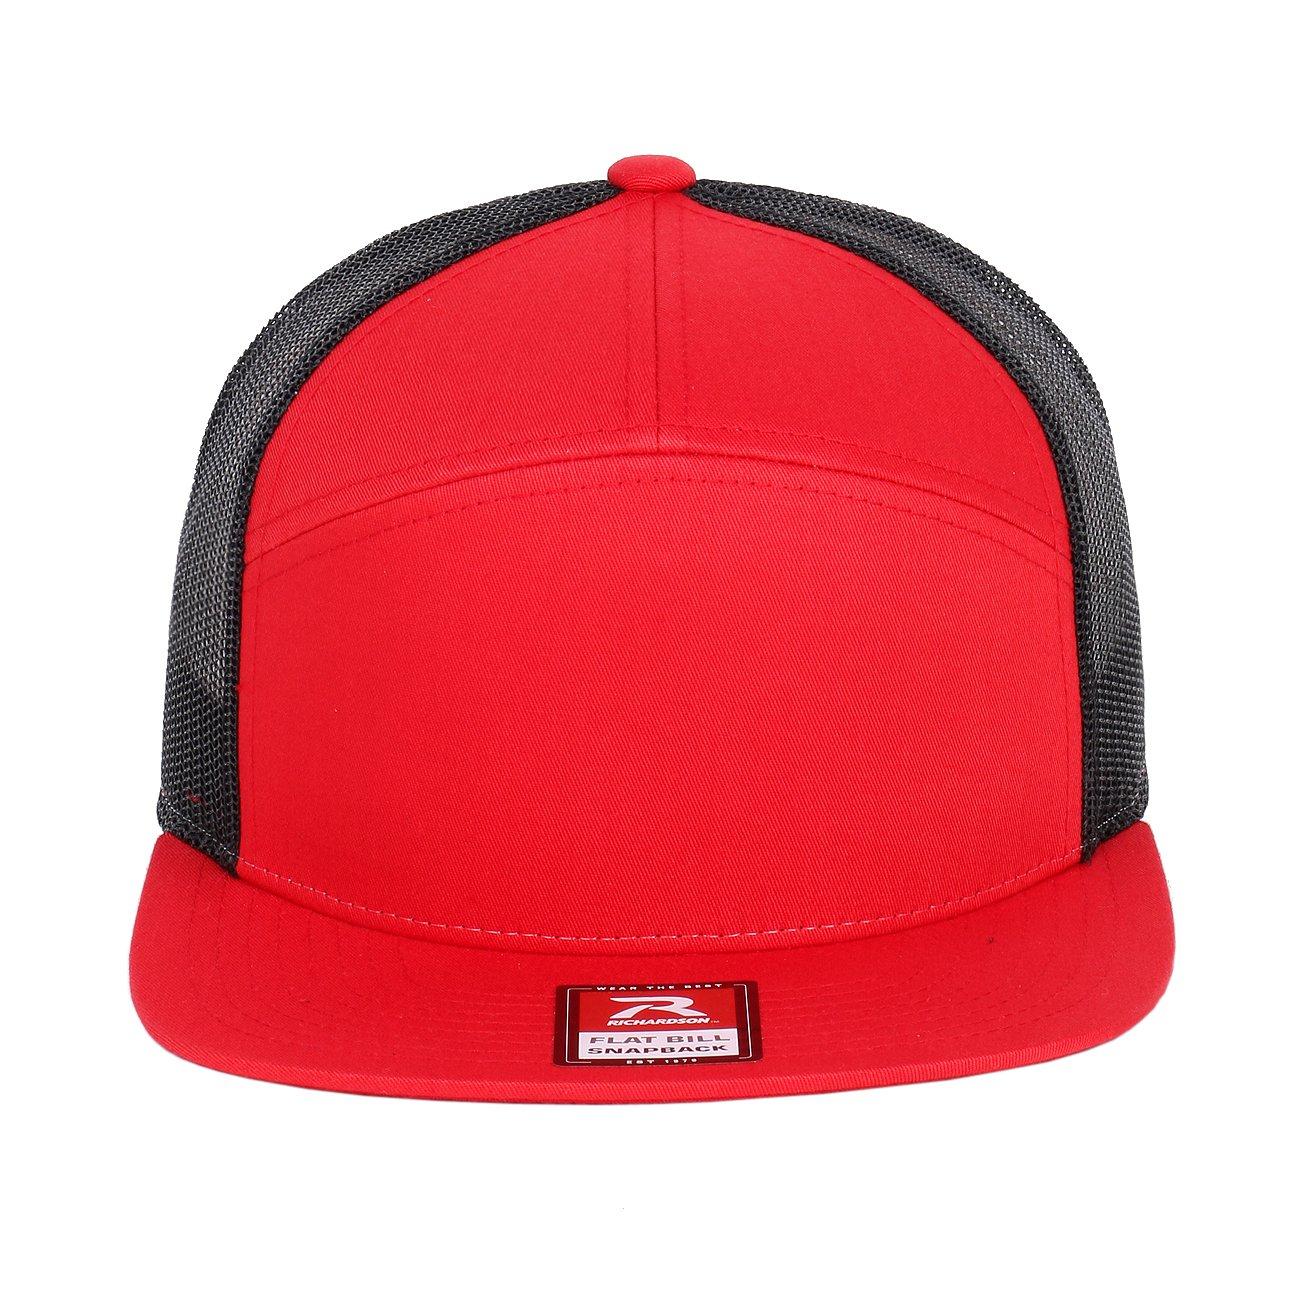 a33fa7c41984cb Richardson 7 Panel Arch Flat Bill Snapback Mesh Trucker Hat (Red-Black) at  Amazon Men's Clothing store: